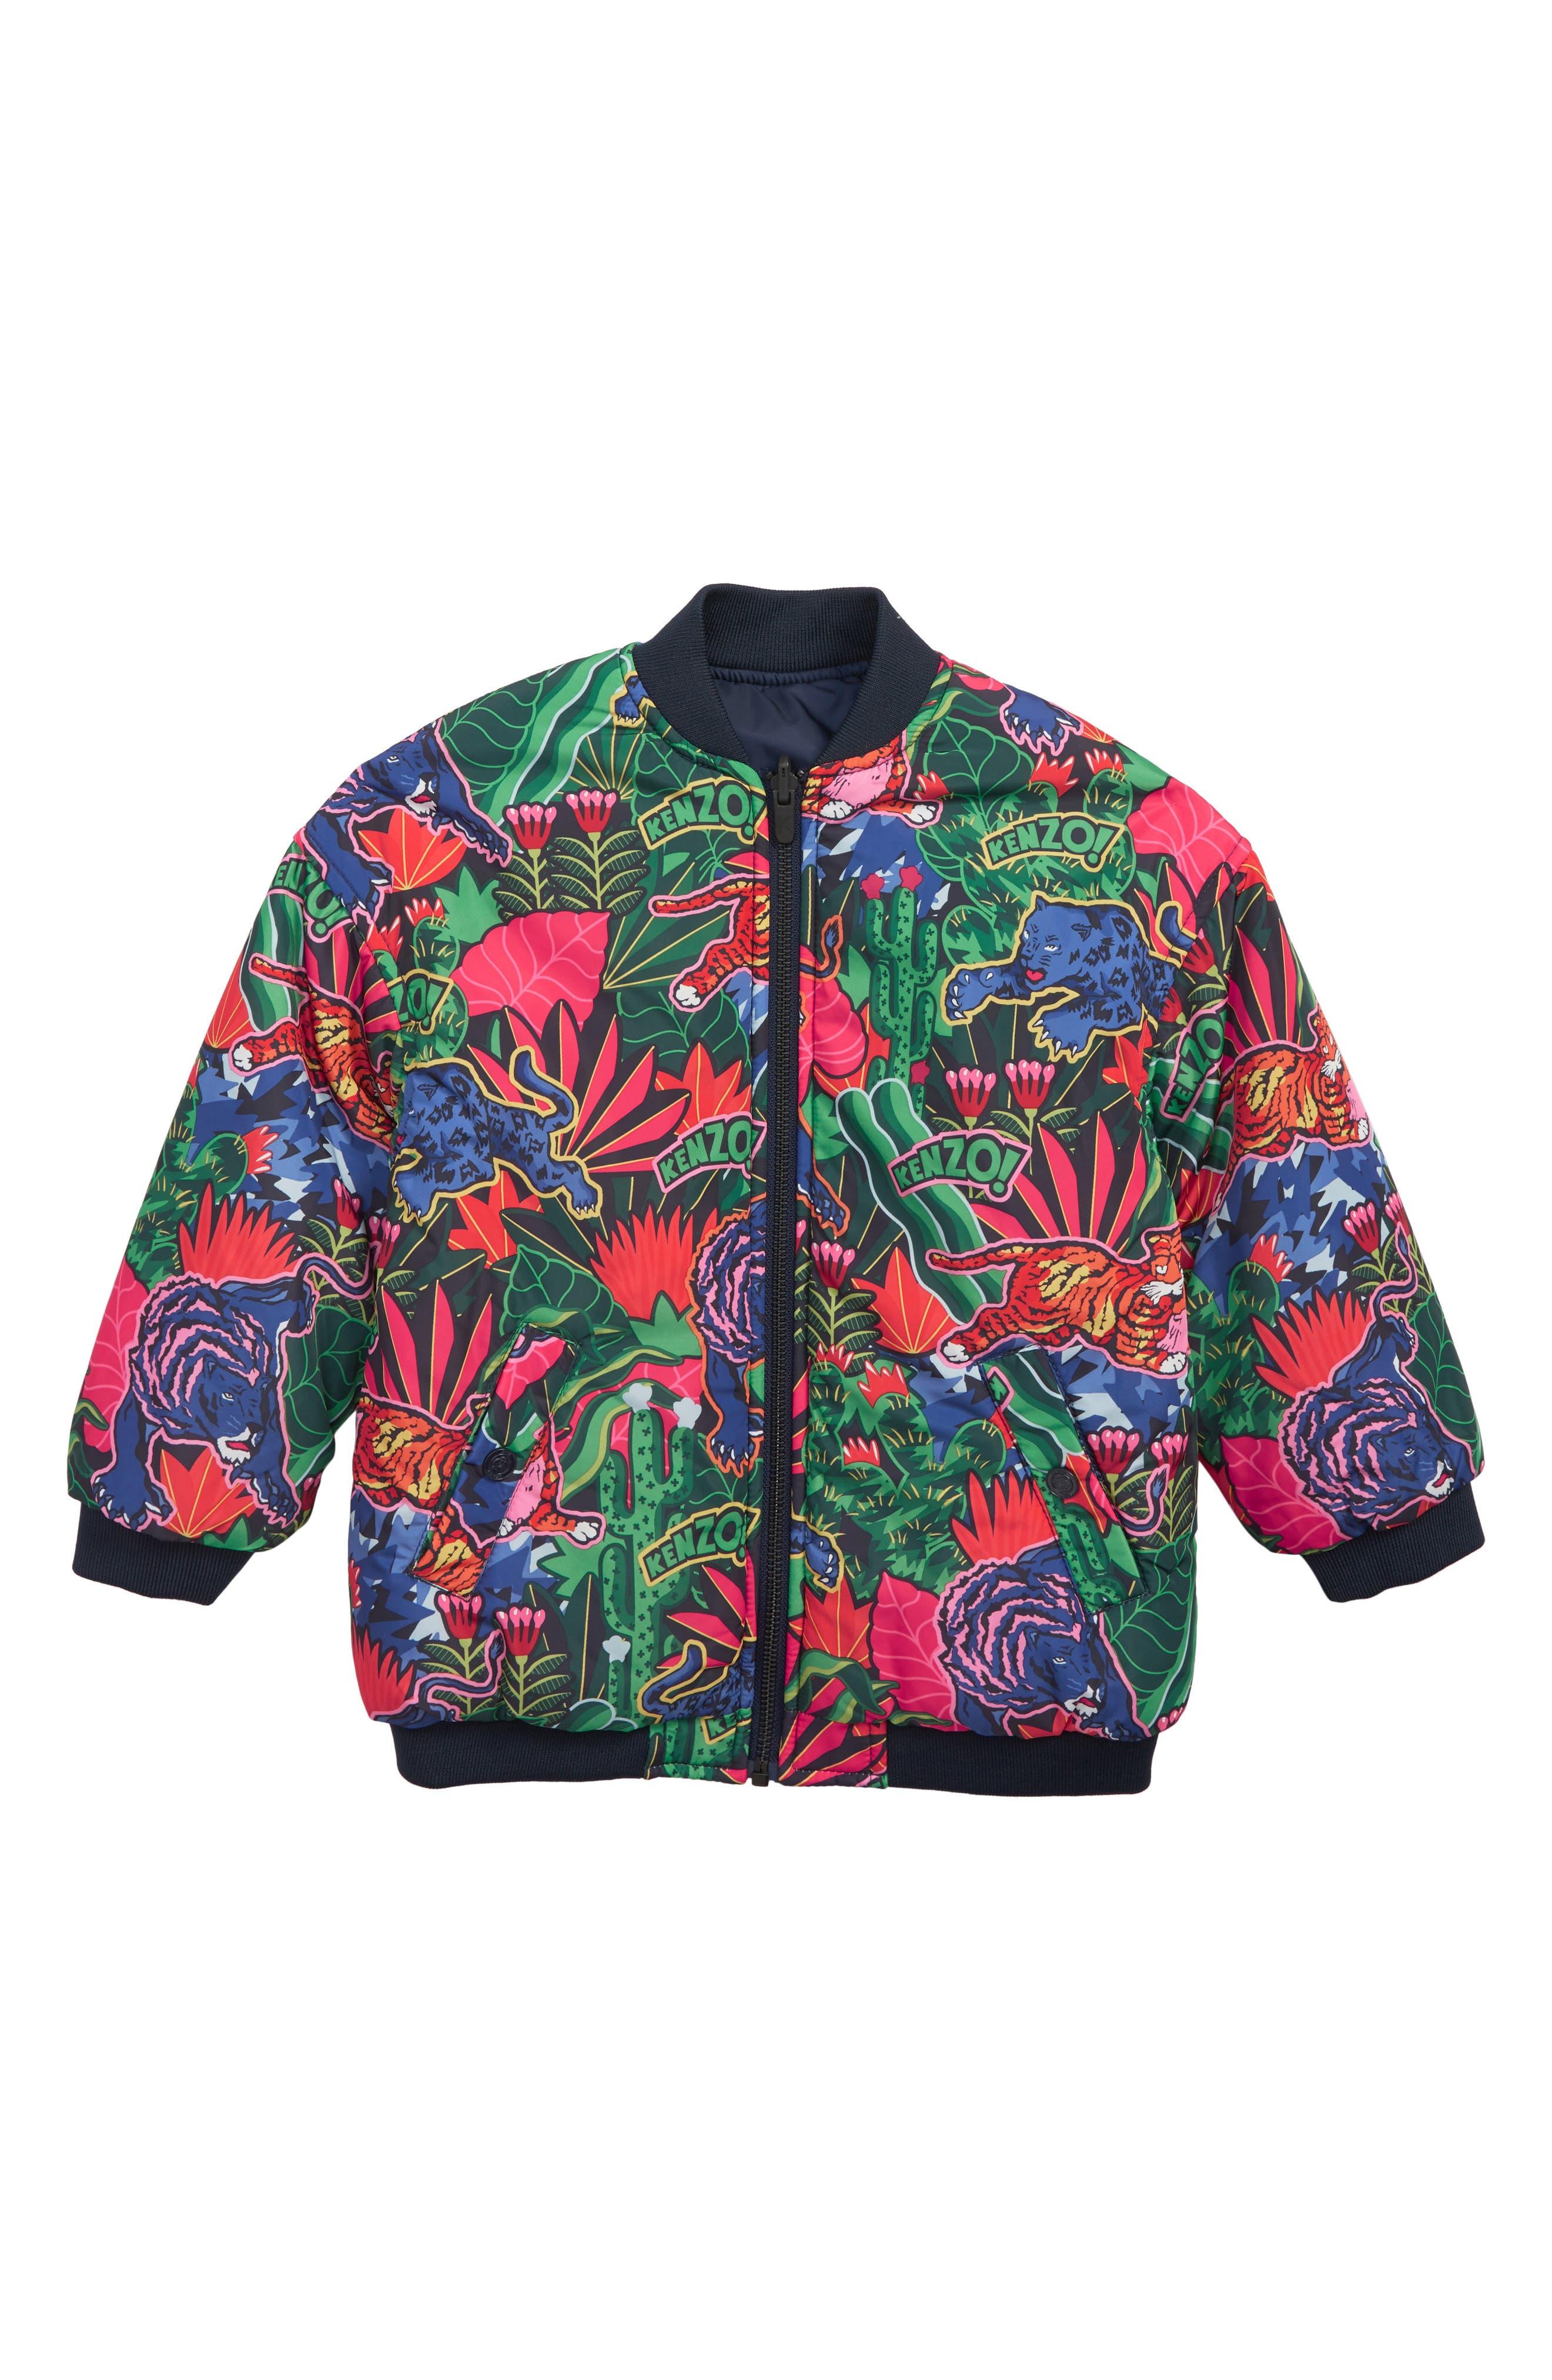 KENZO Reversible Puffer Jacket, Main, color, NAVY